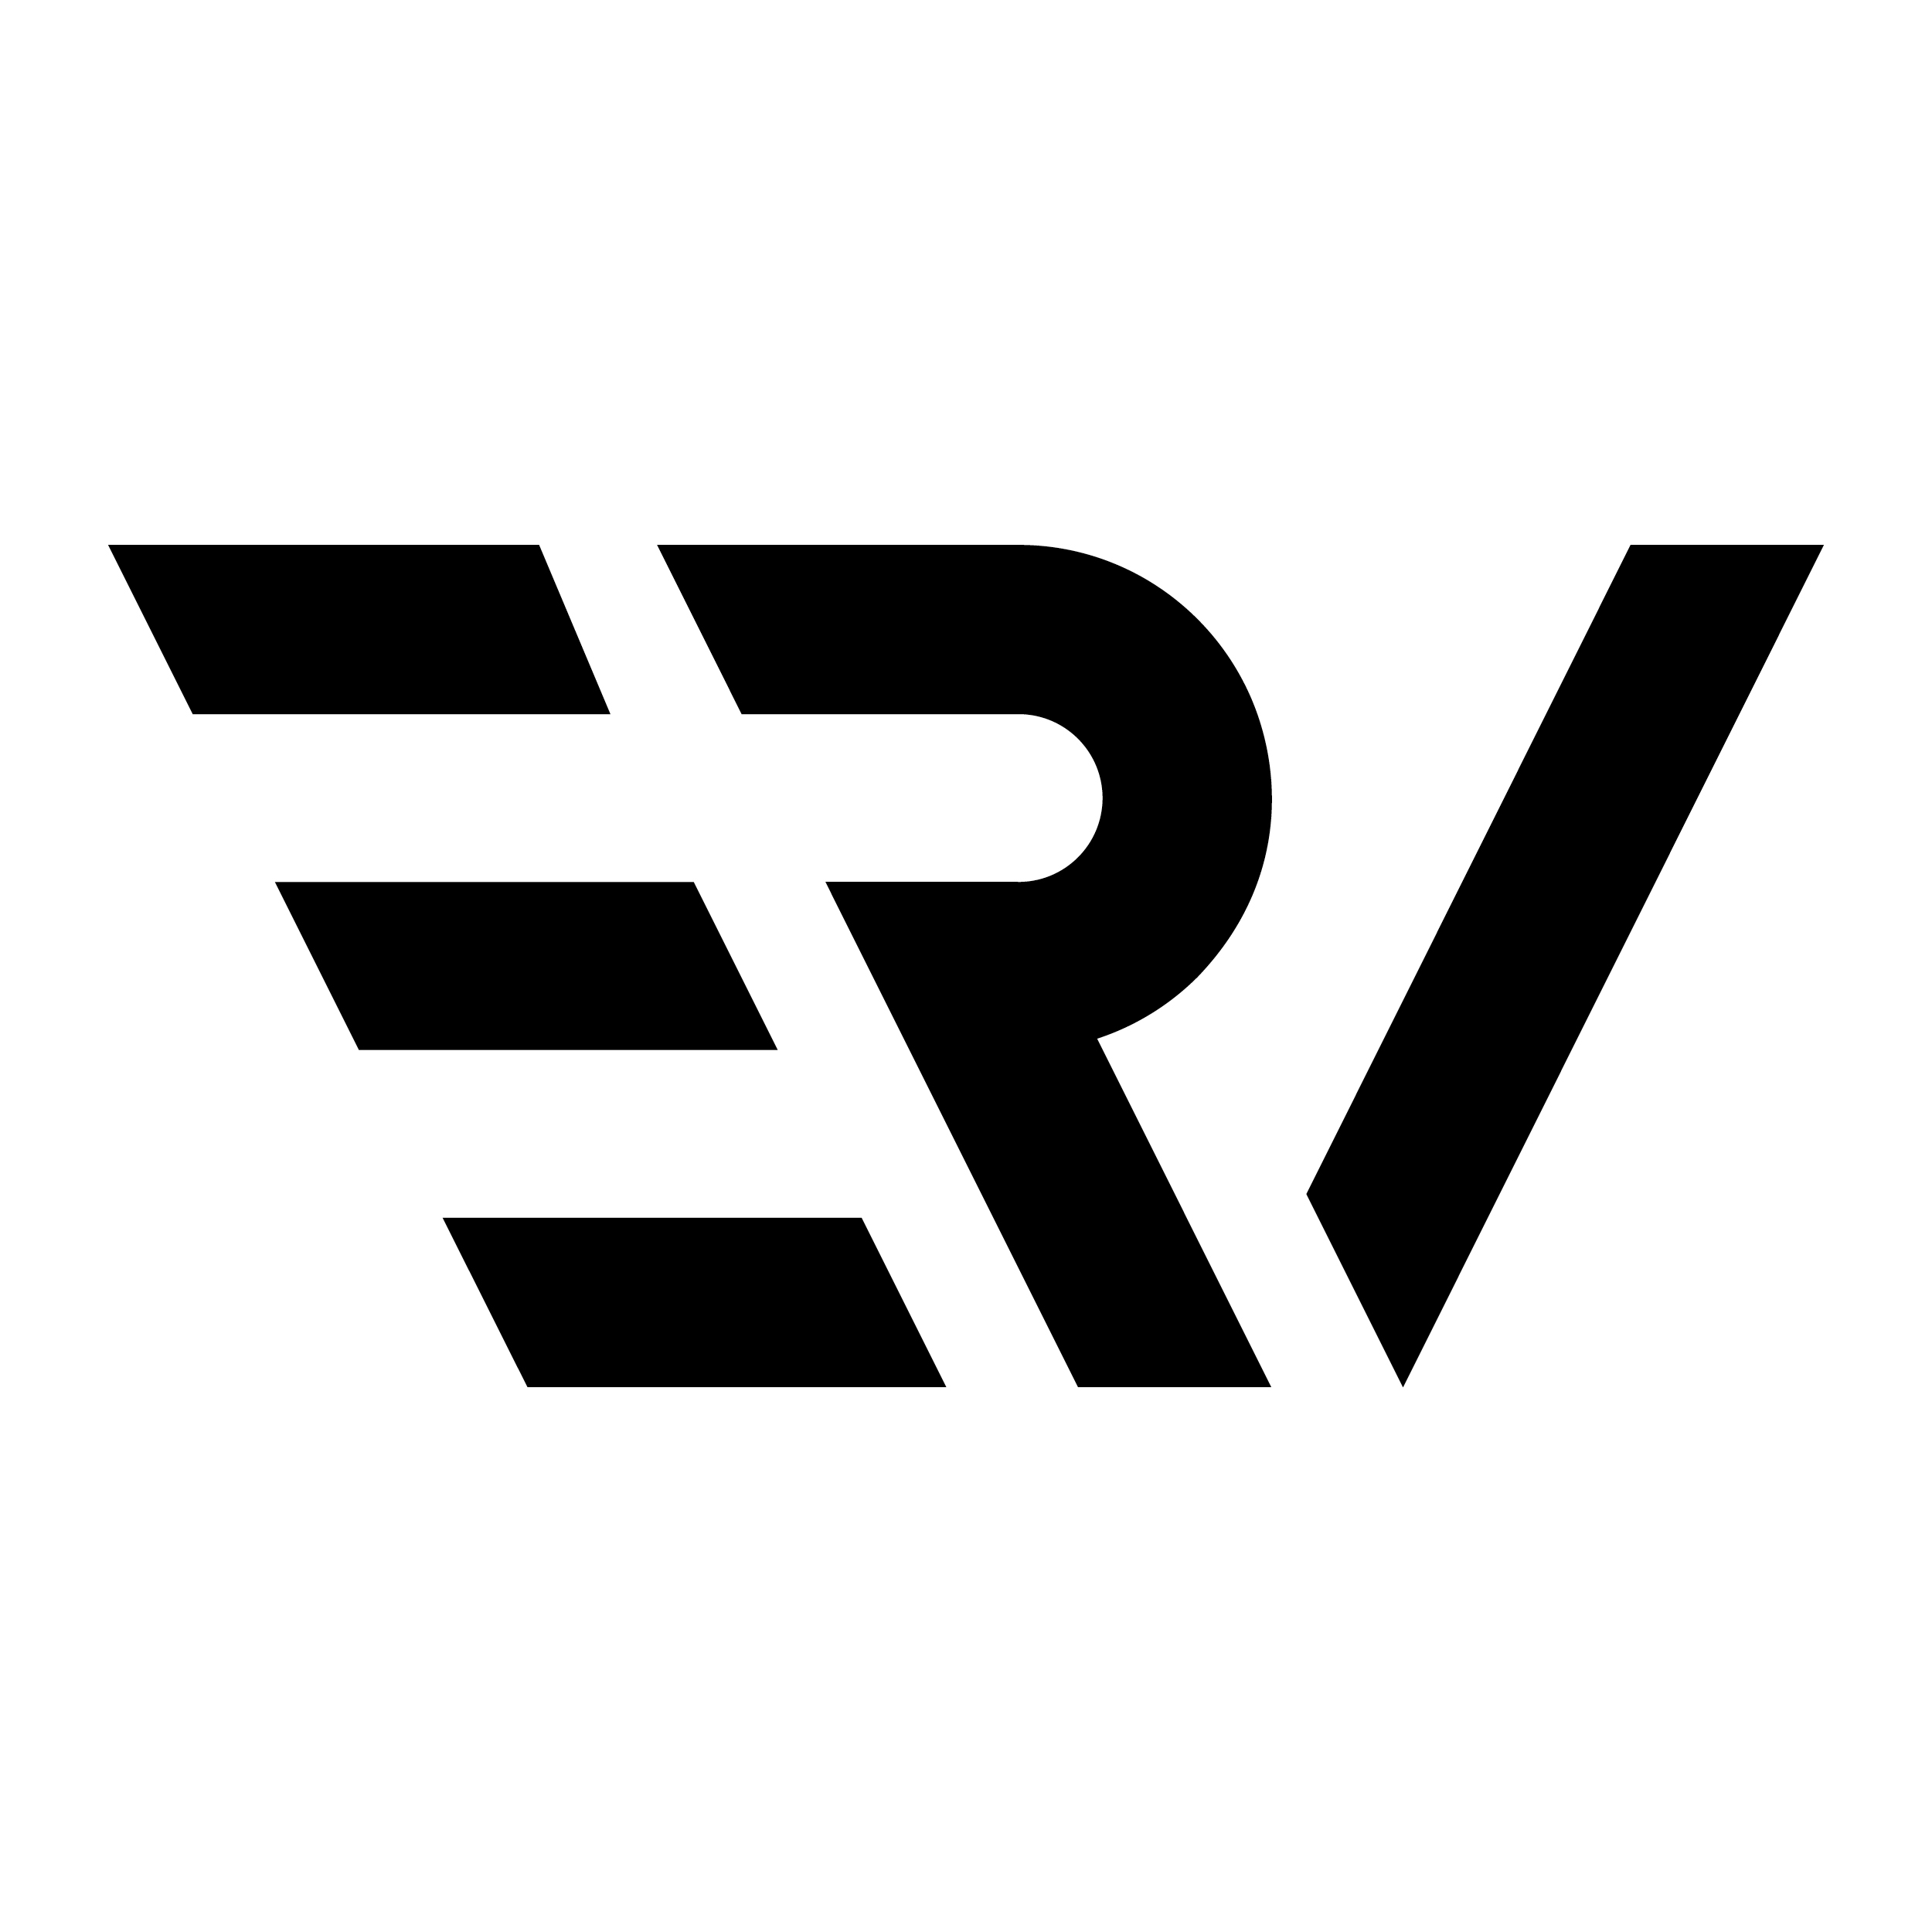 2018-Folio-logos-2500x2500px47.jpg